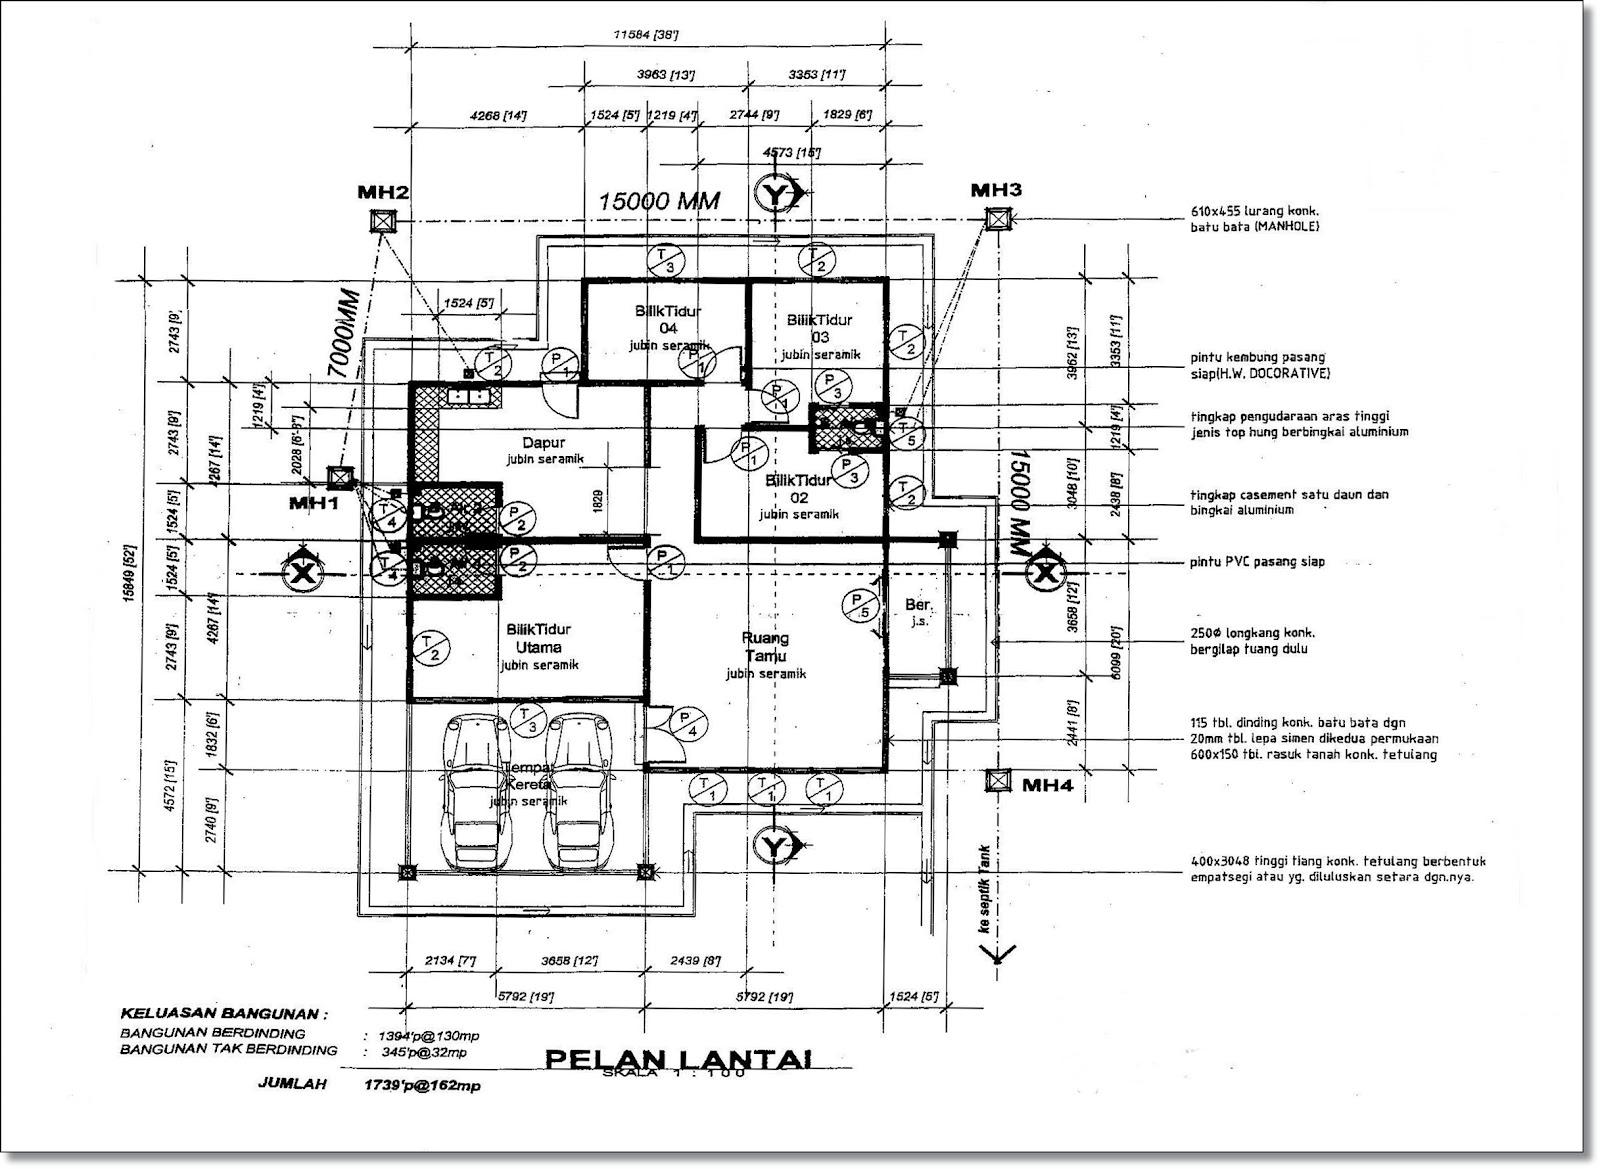 Pin Rumah Banglo Setingkat Architecture And Post Pelan Lantai Kamistad ...